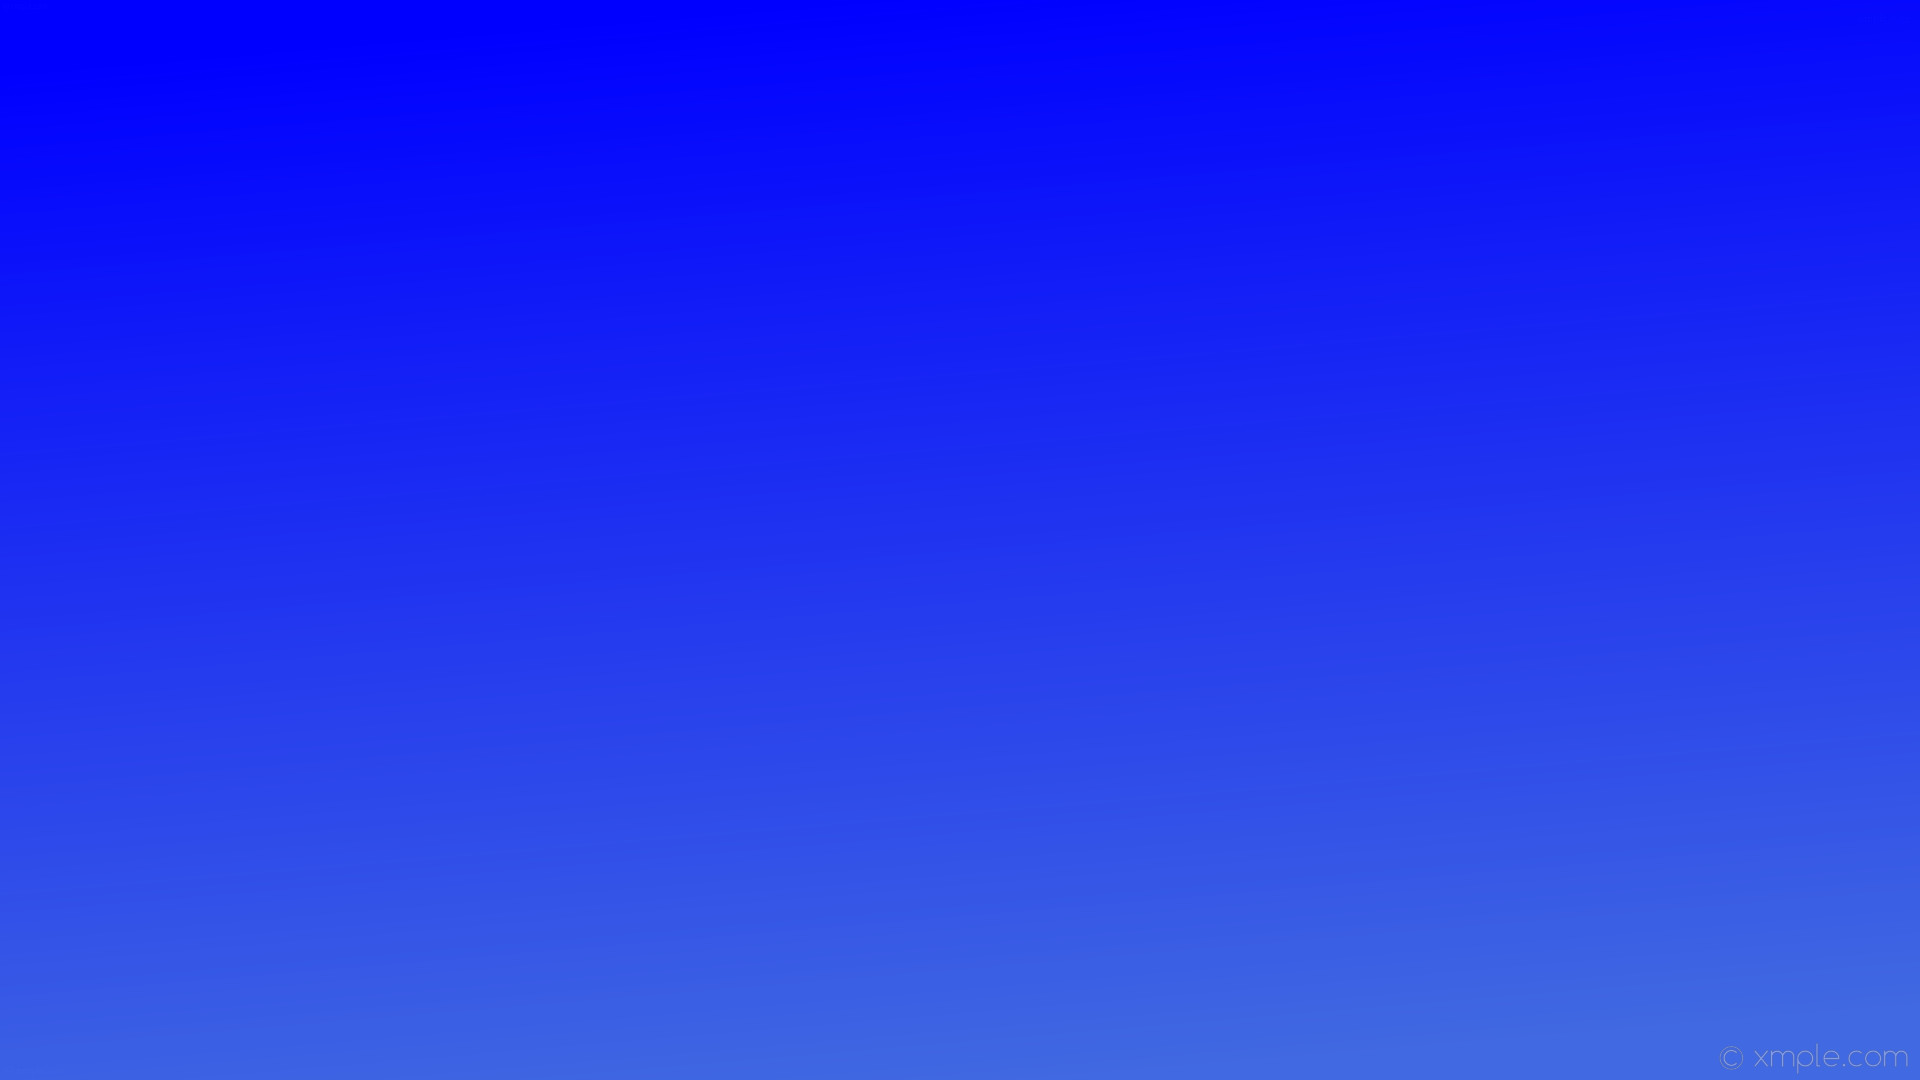 wallpaper linear gradient blue royal blue #0000ff #4169e1 105°